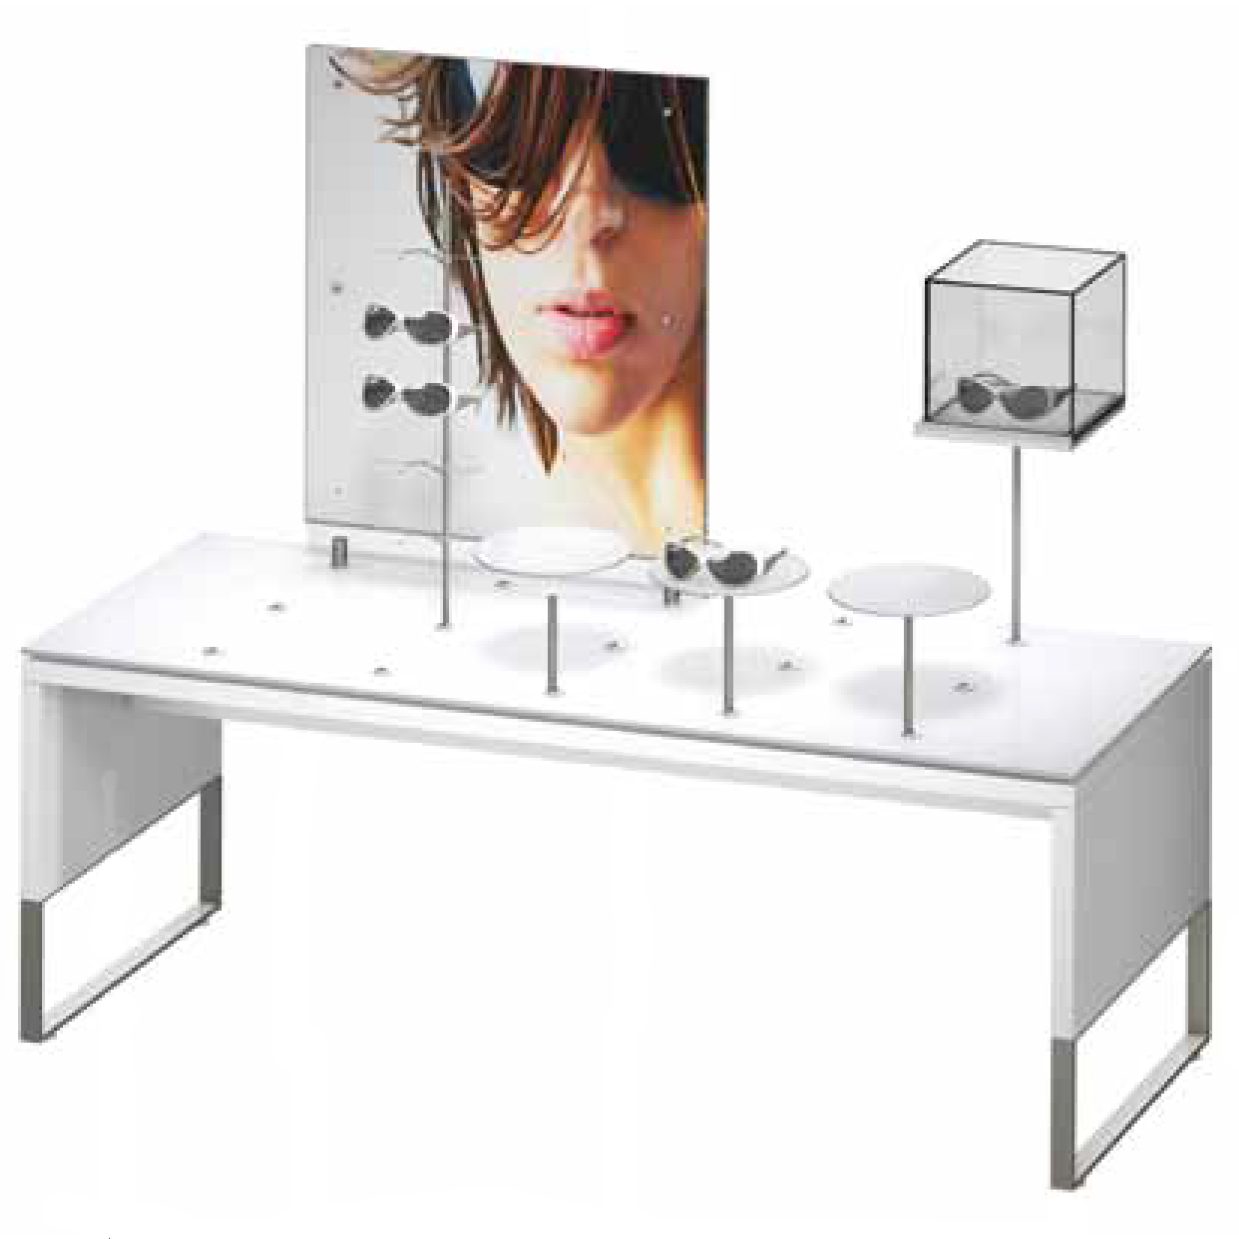 POS Table